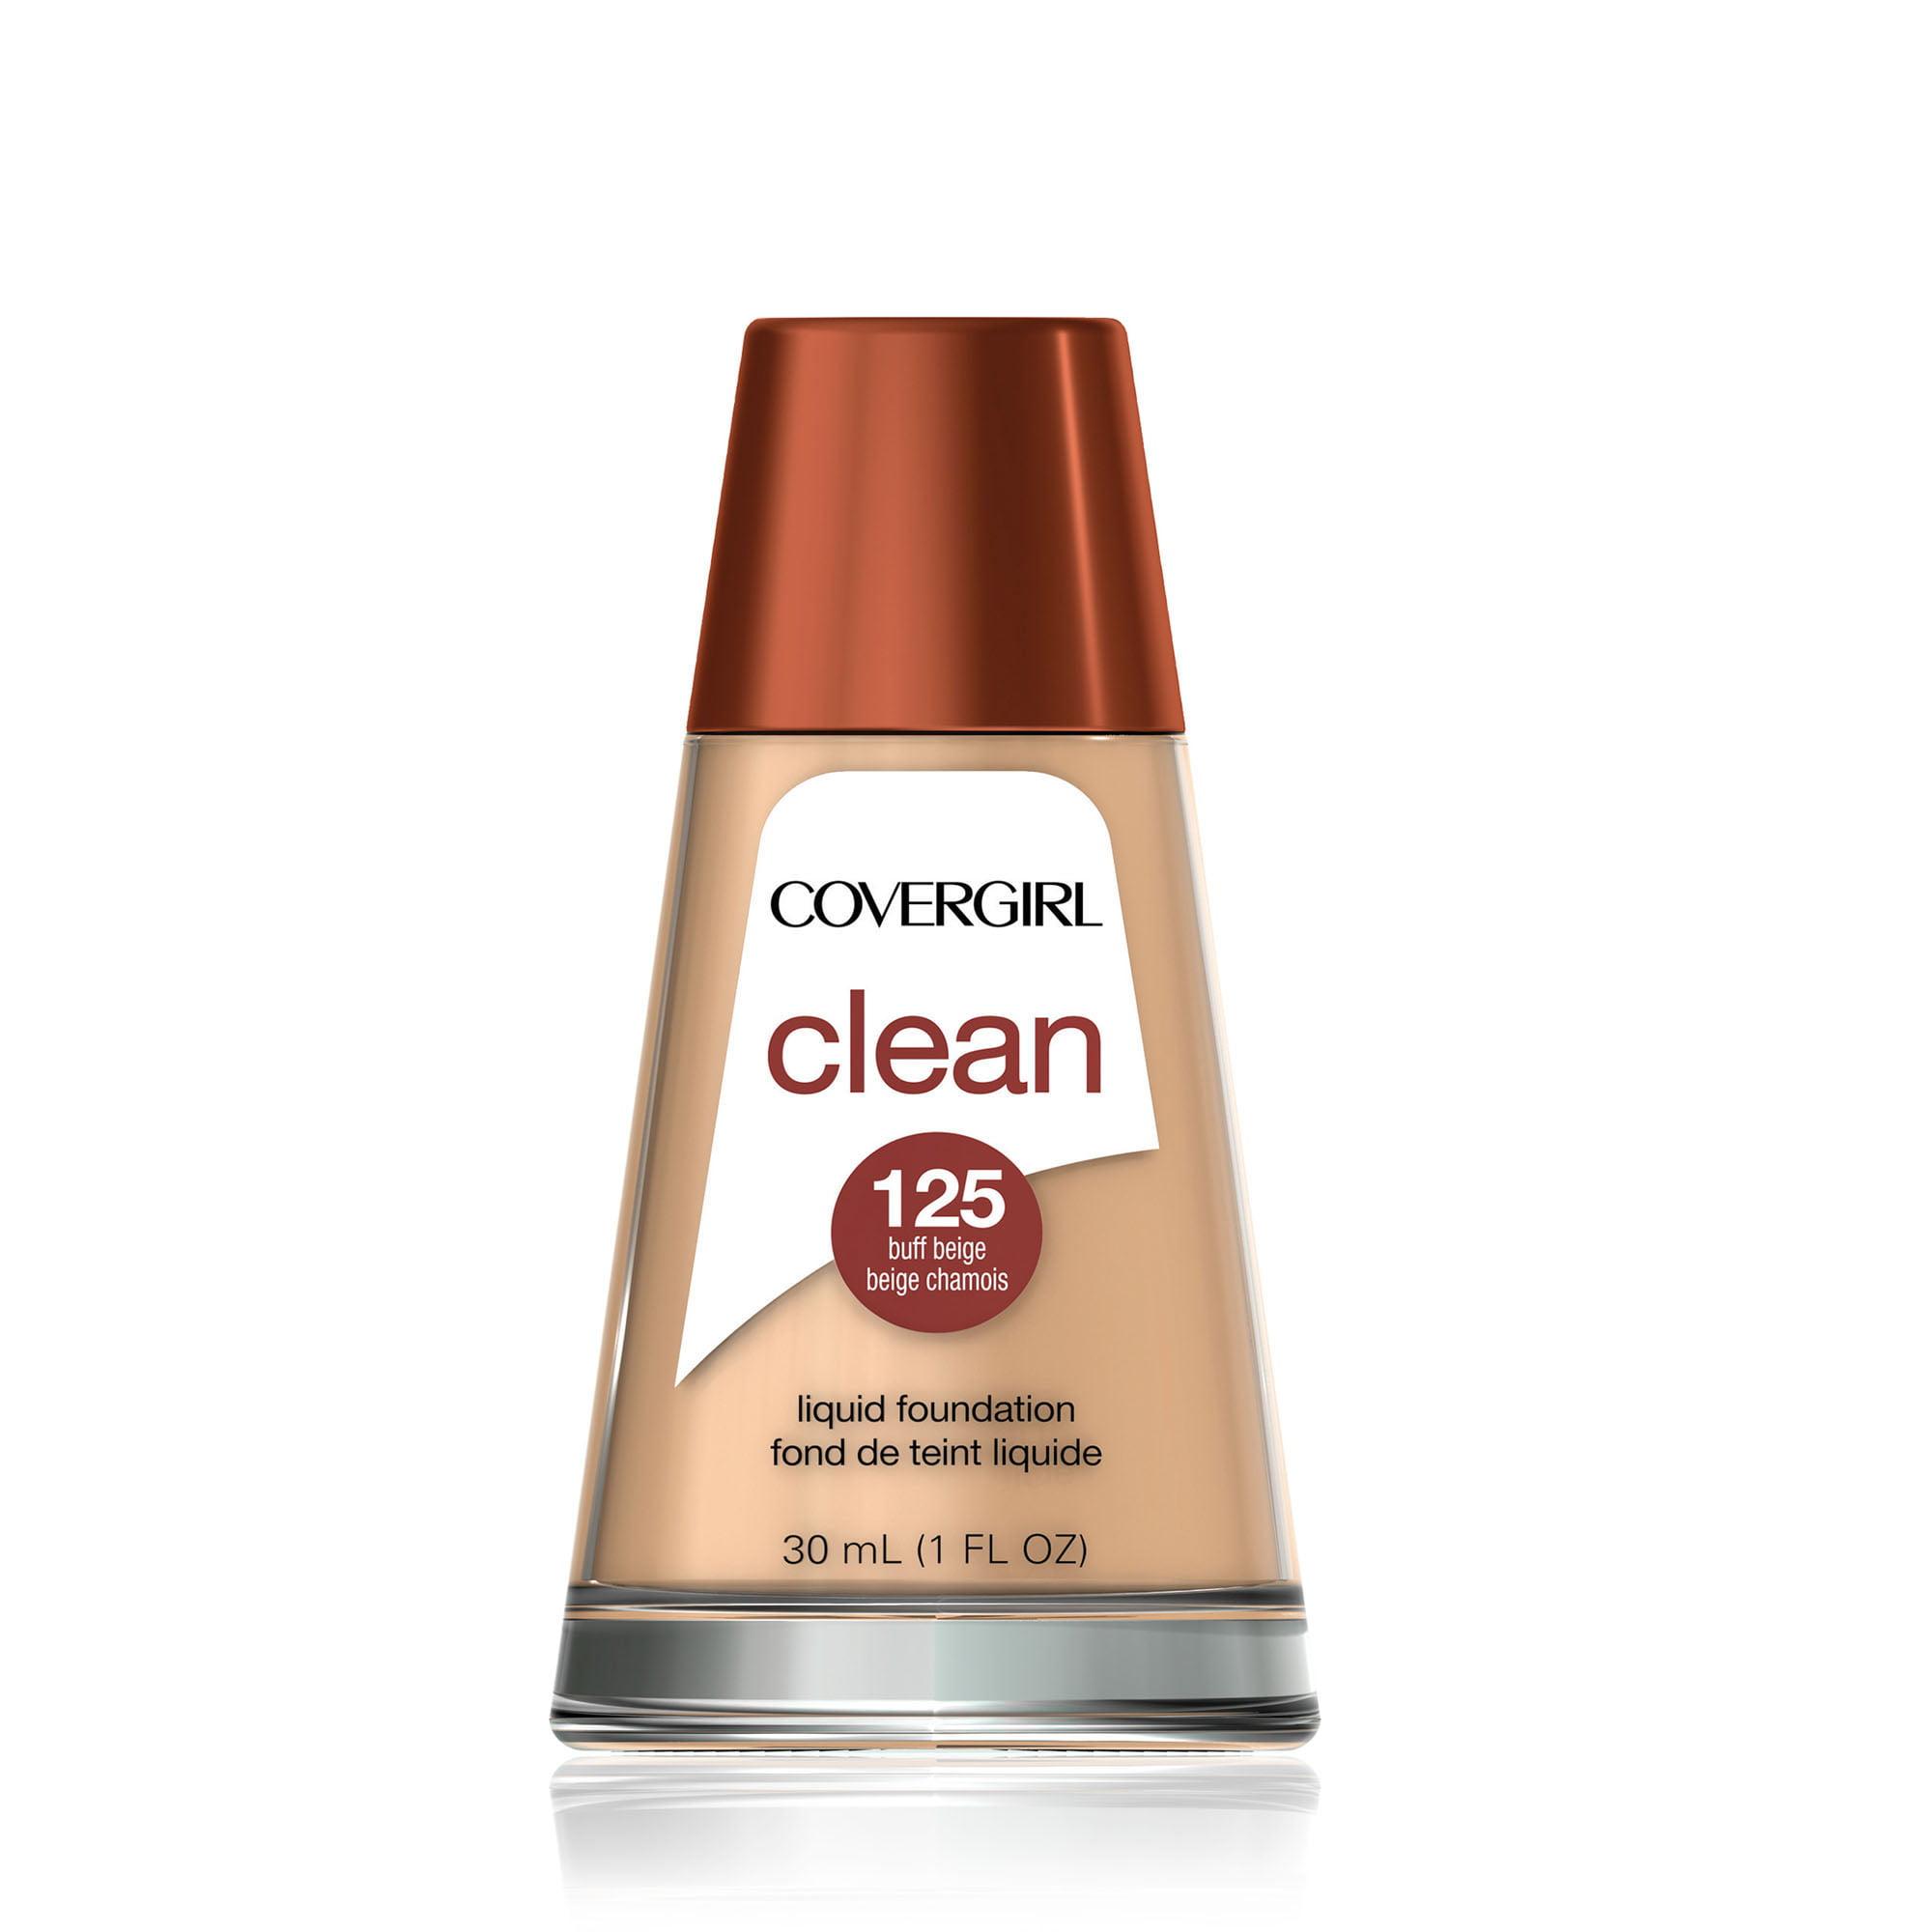 COVERGIRL Clean Makeup Liquid Foundation, Buff Beige, 1 fl oz (30 ml)